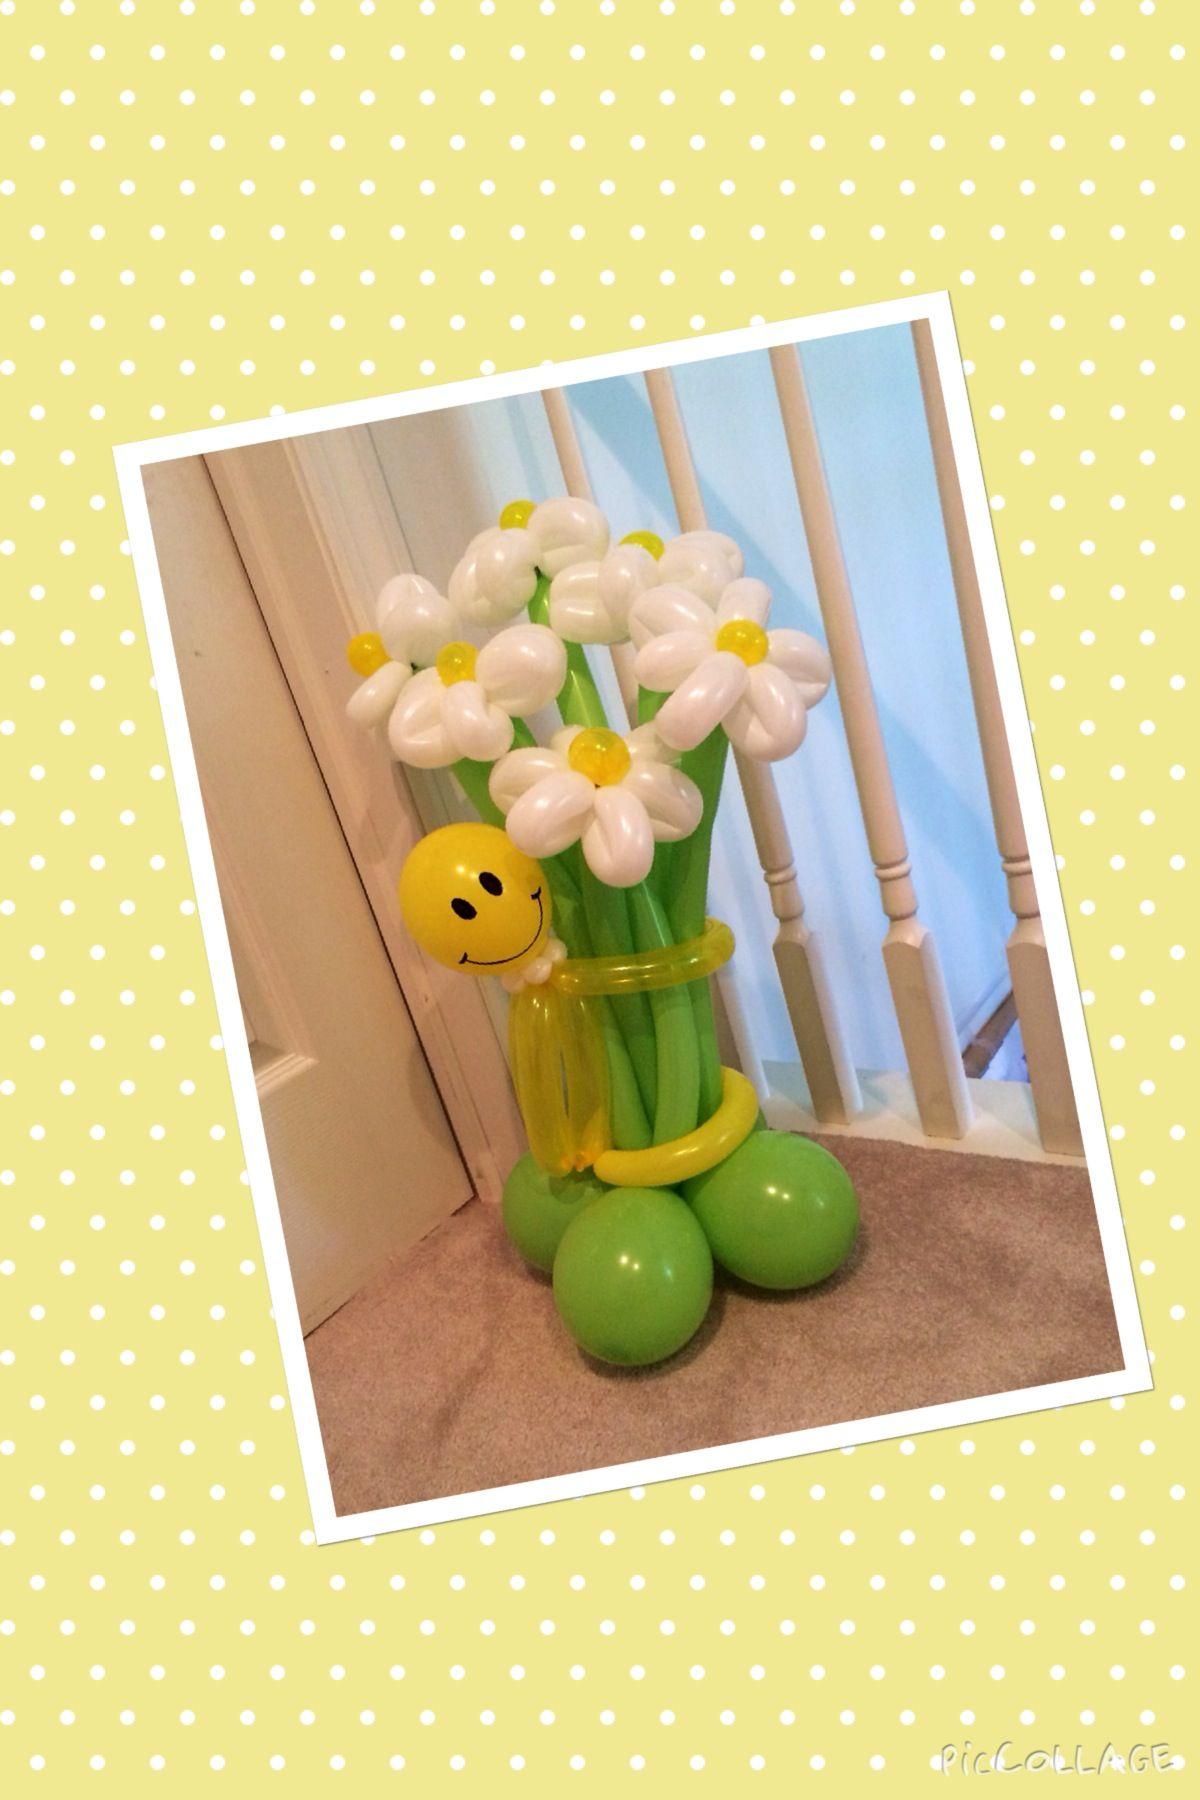 Smiley face flower balloon bouquet balloonatics llc creations smiley face flower balloon bouquet izmirmasajfo